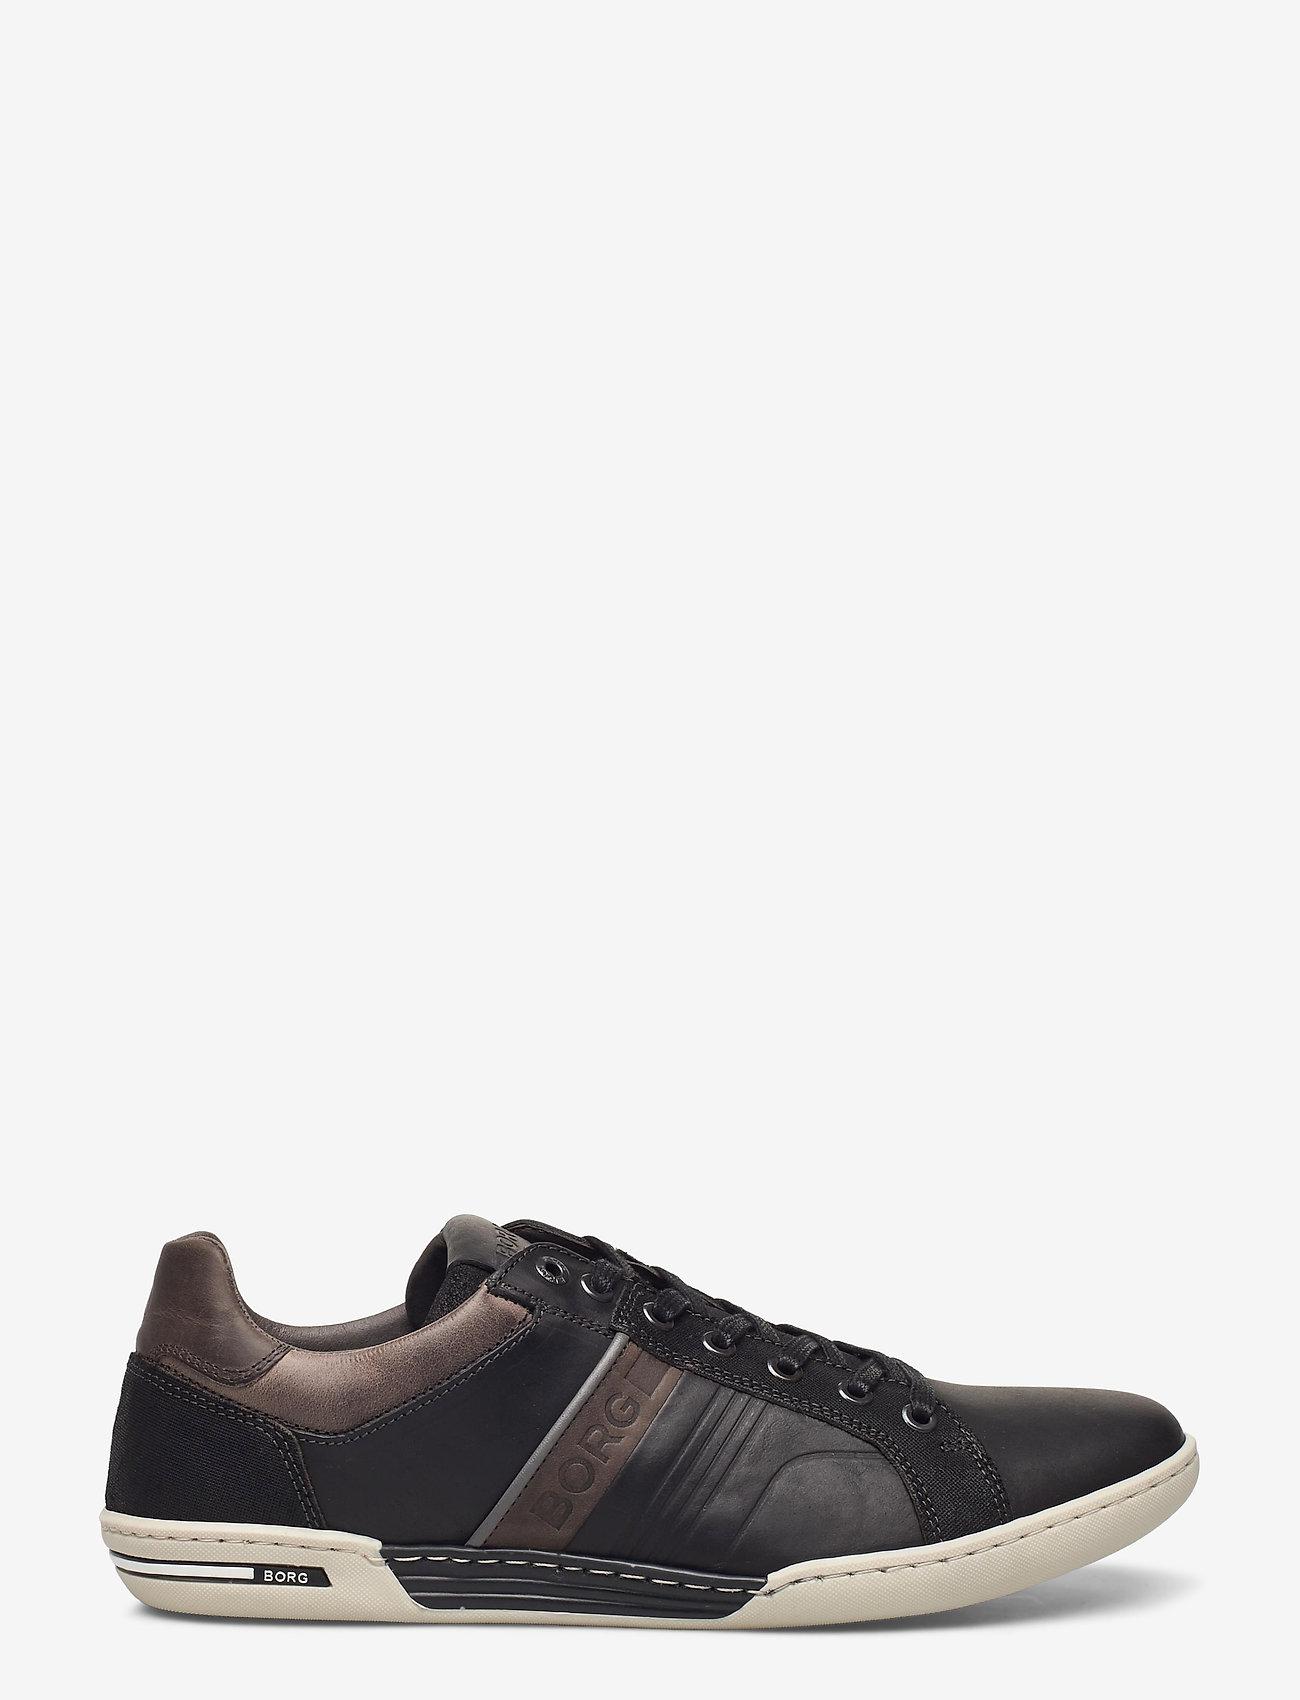 Björn Borg - COLTRANE NU LUX M - laag sneakers - black - 1